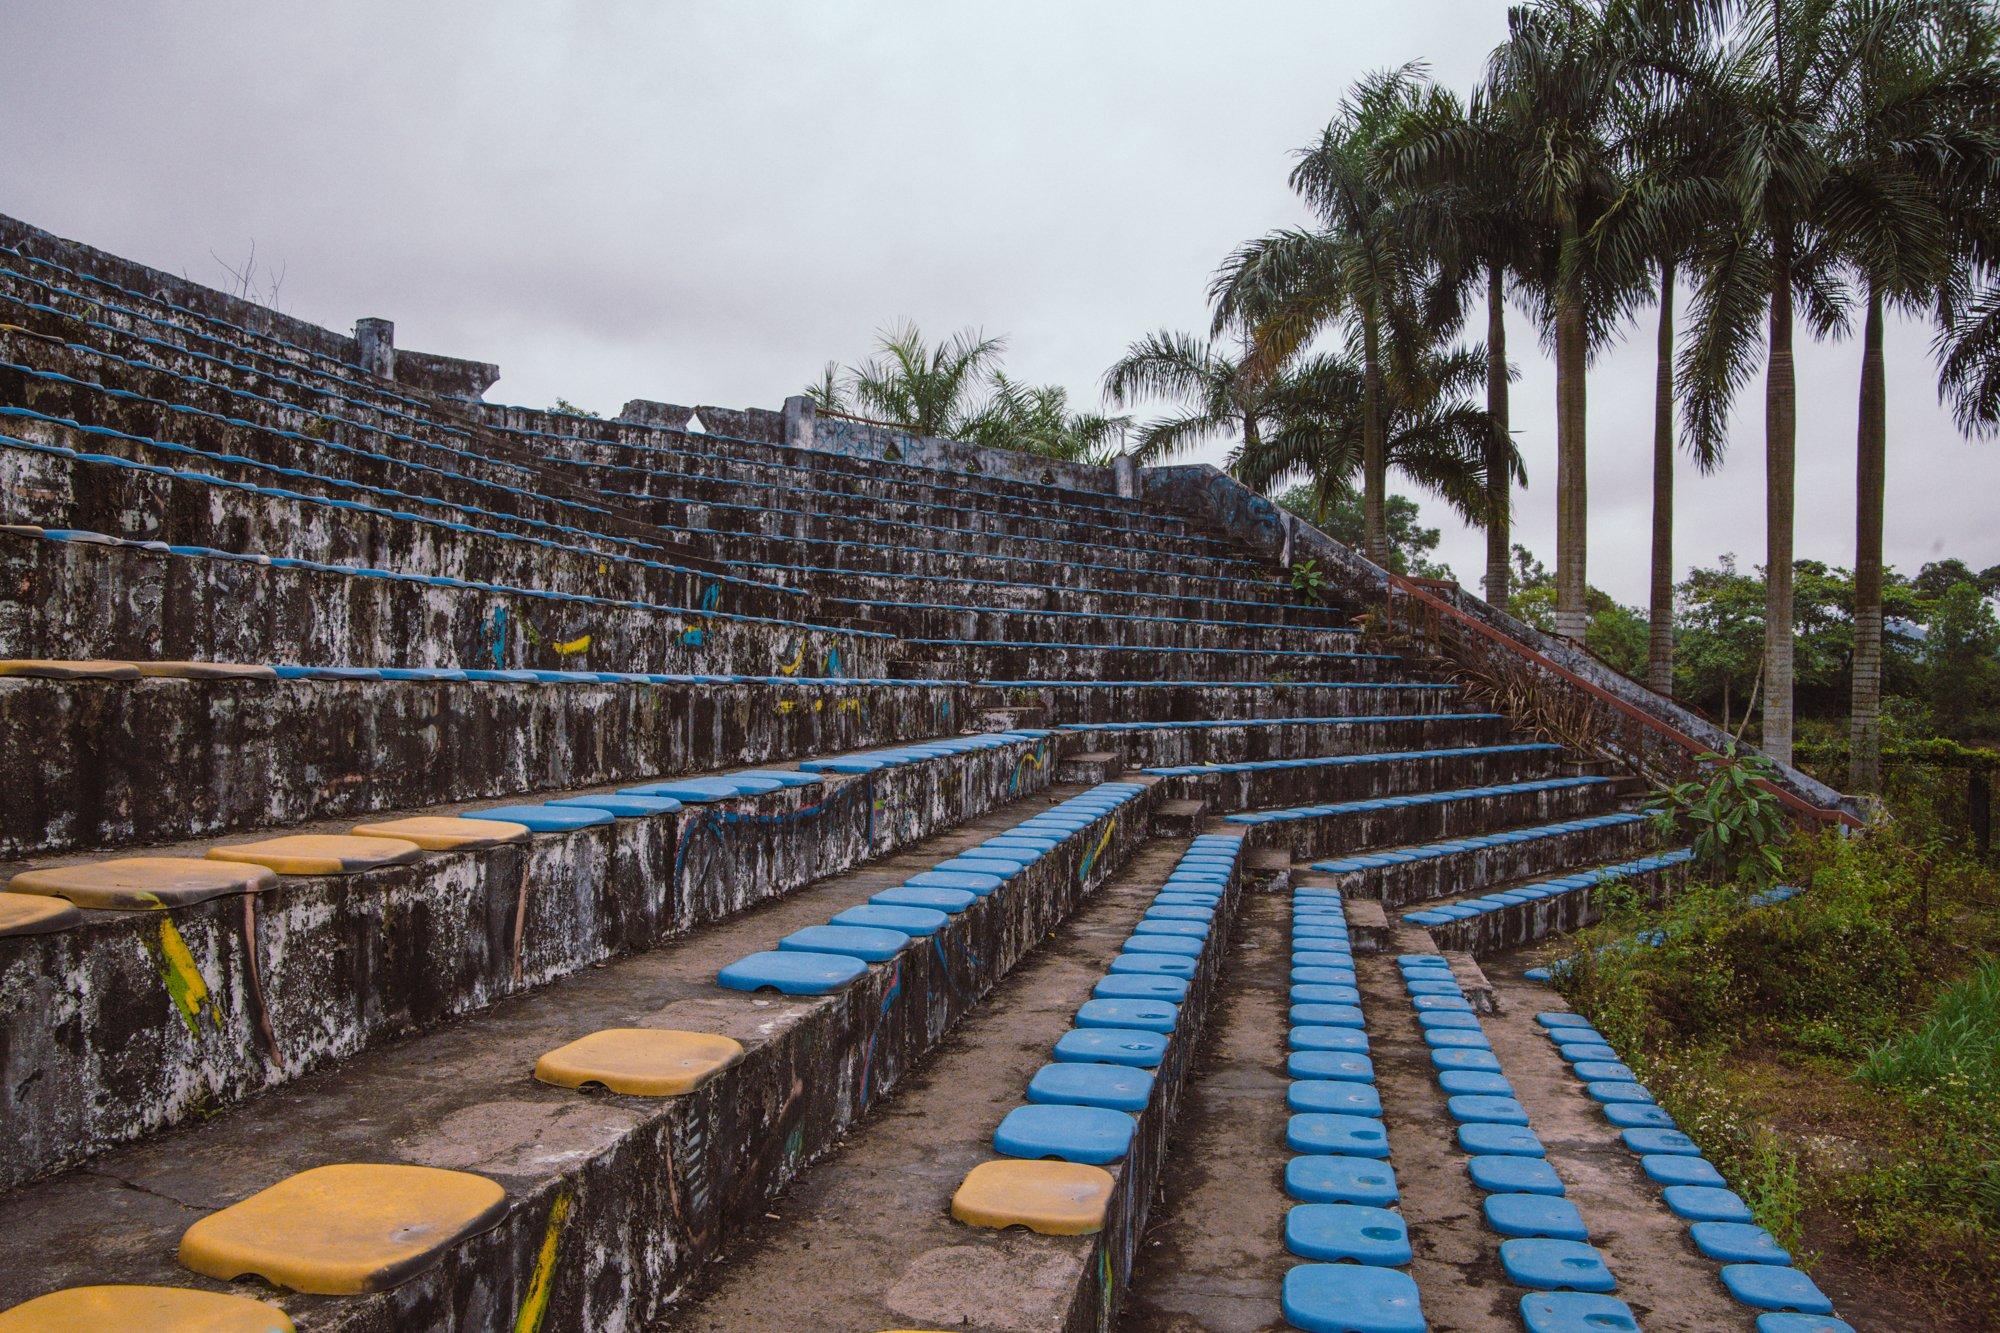 Theatre stadium at the abandoned waterpark hue, vietnam